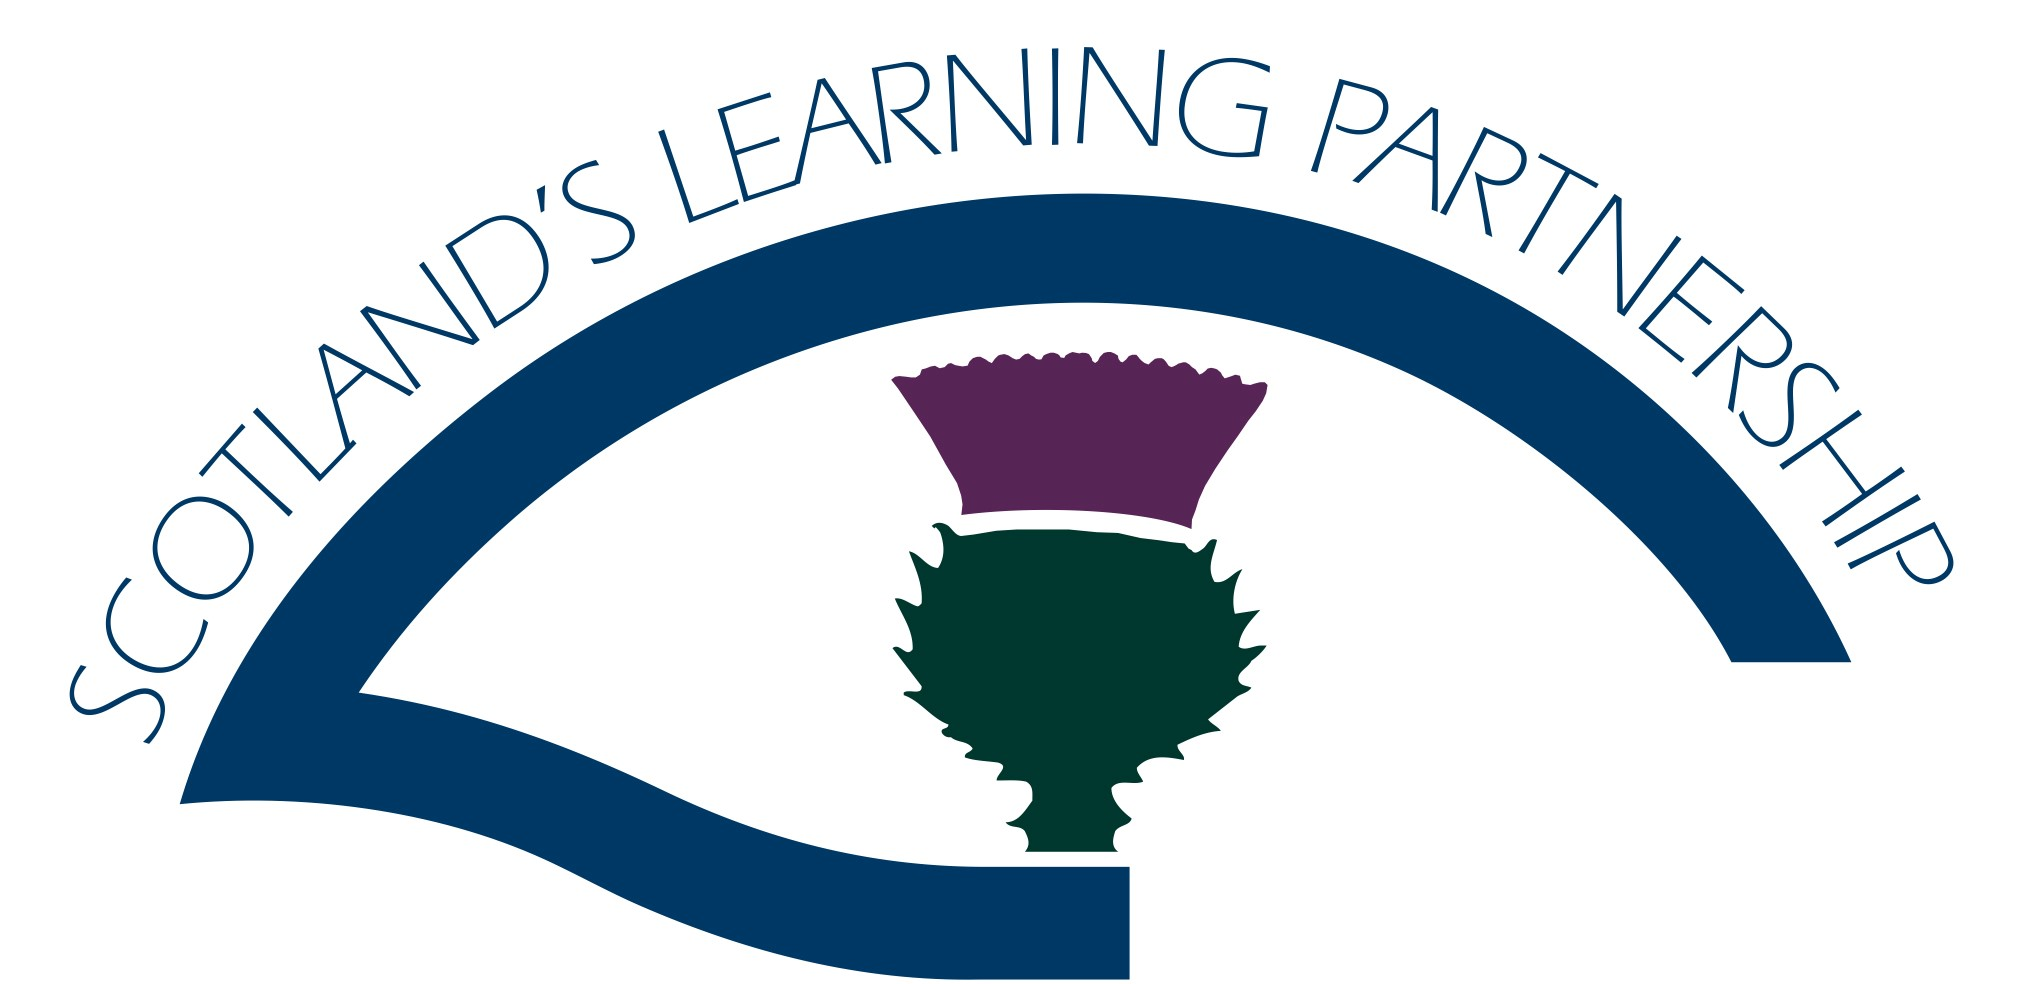 Scotland's Learning Partnership